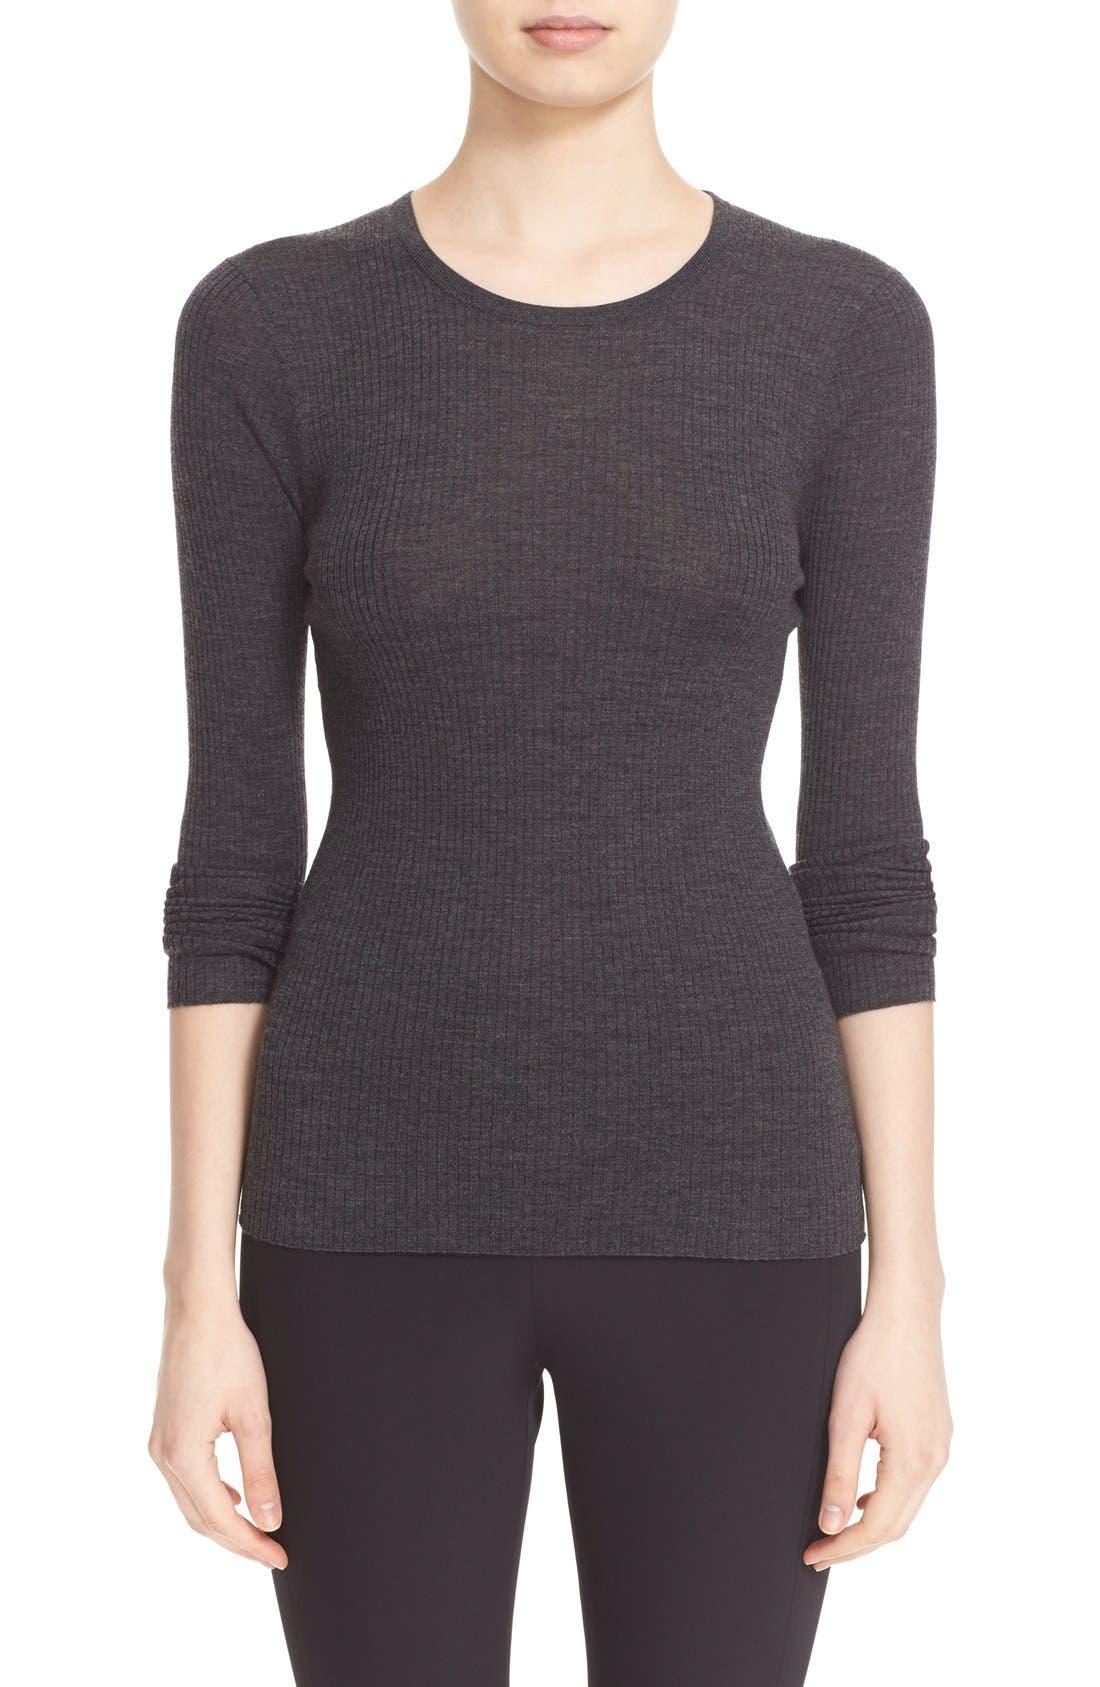 'Mirzi' Rib Knit Merino Wool Sweater,                             Main thumbnail 1, color,                             CHARCOAL MELANGE